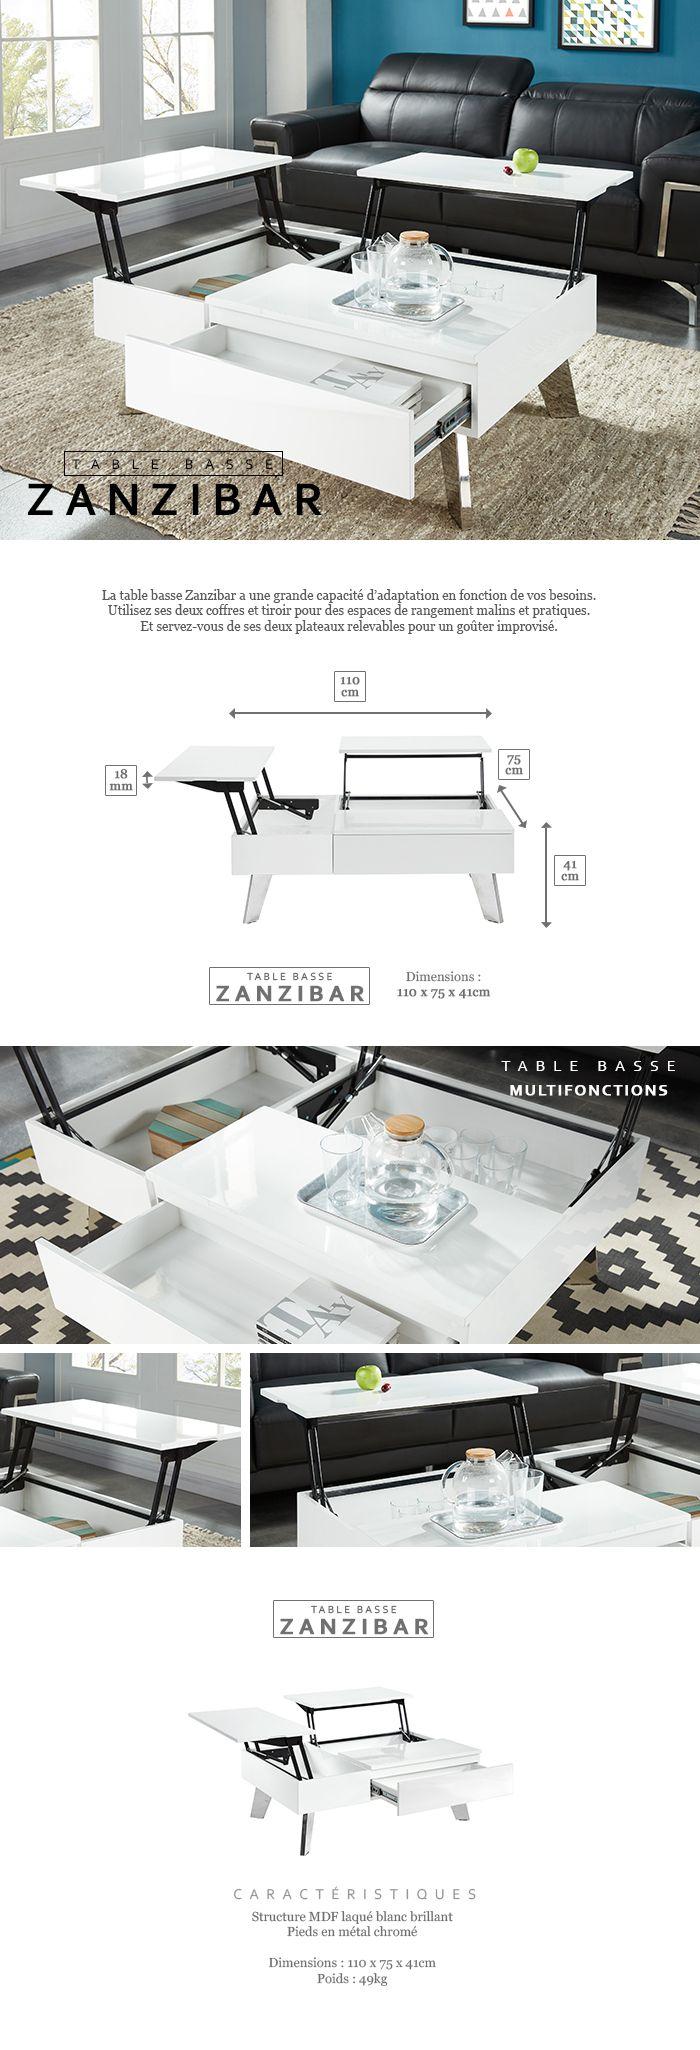 zanzibar table basse transformable style contemporain laqu blanc brillant avec pieds chrom s. Black Bedroom Furniture Sets. Home Design Ideas